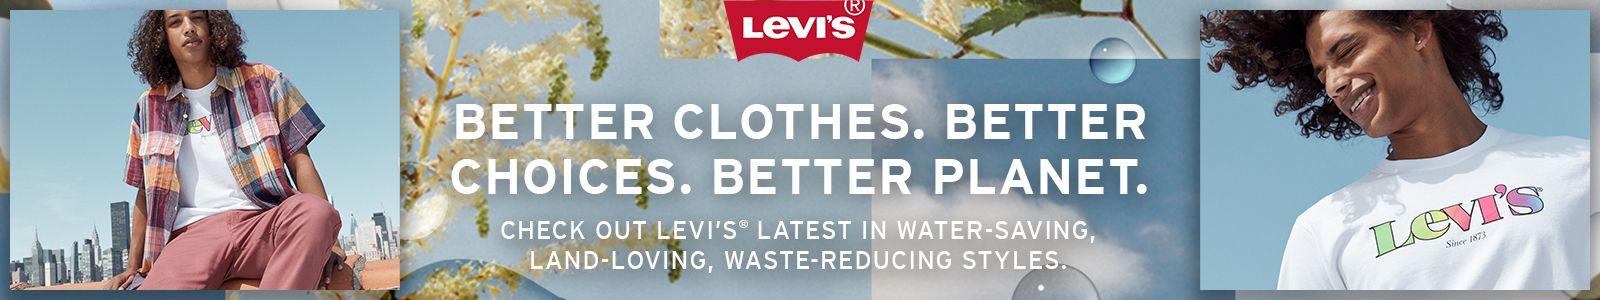 Levis, Better Clothes, Better Choices, Better Planet